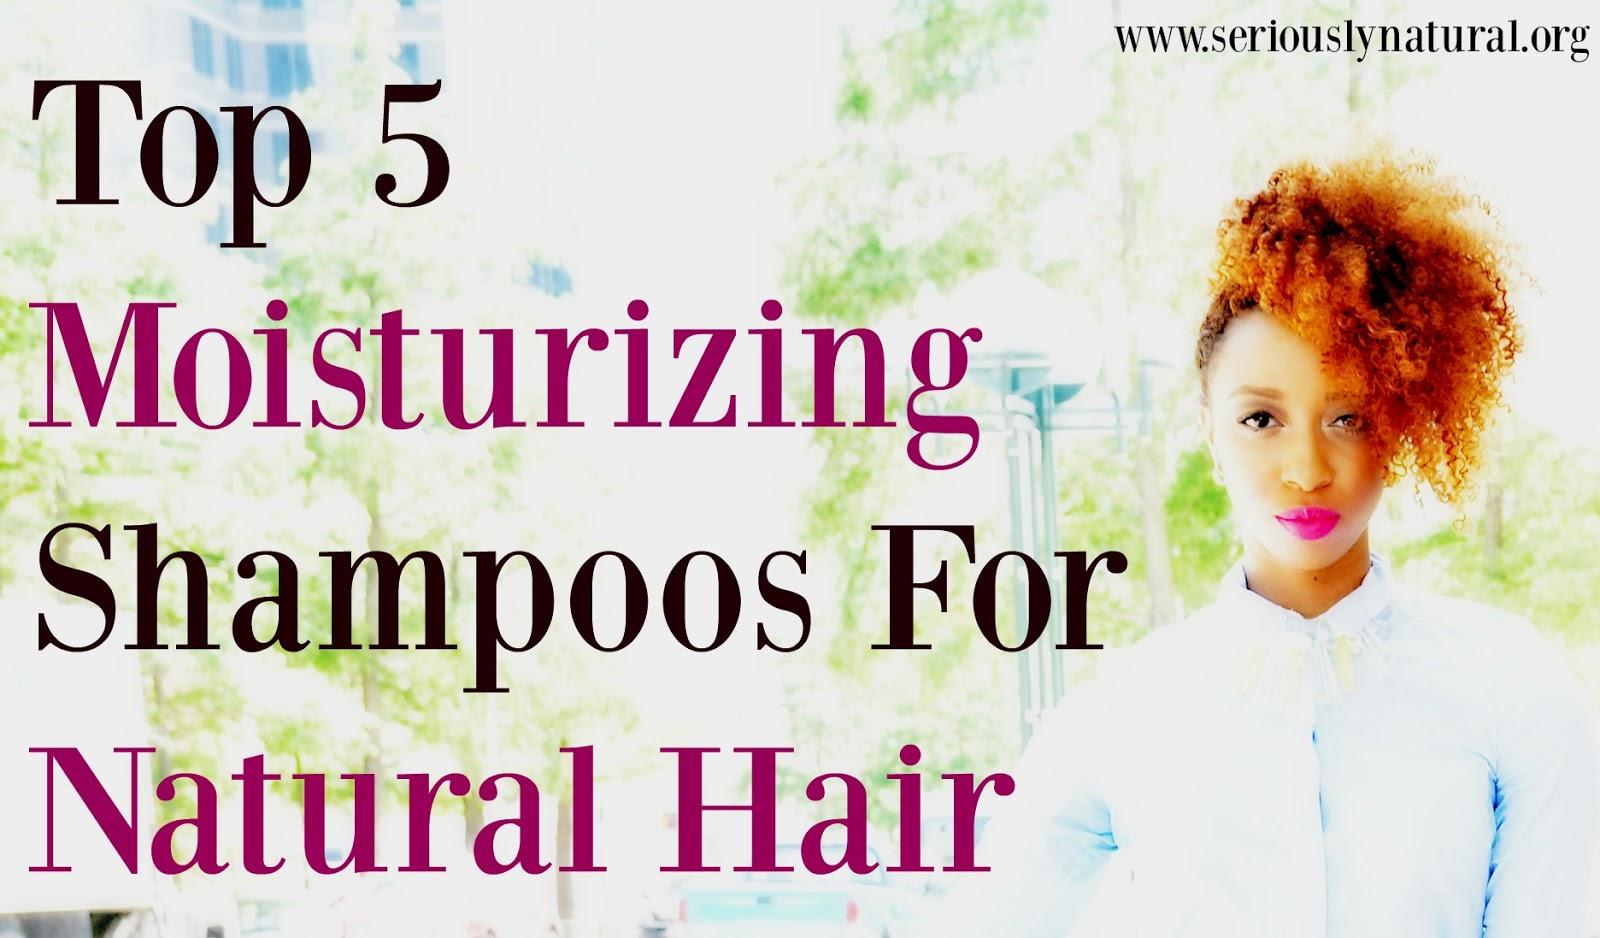 Top 5 Moisturizing Shampoos For Natural Hair